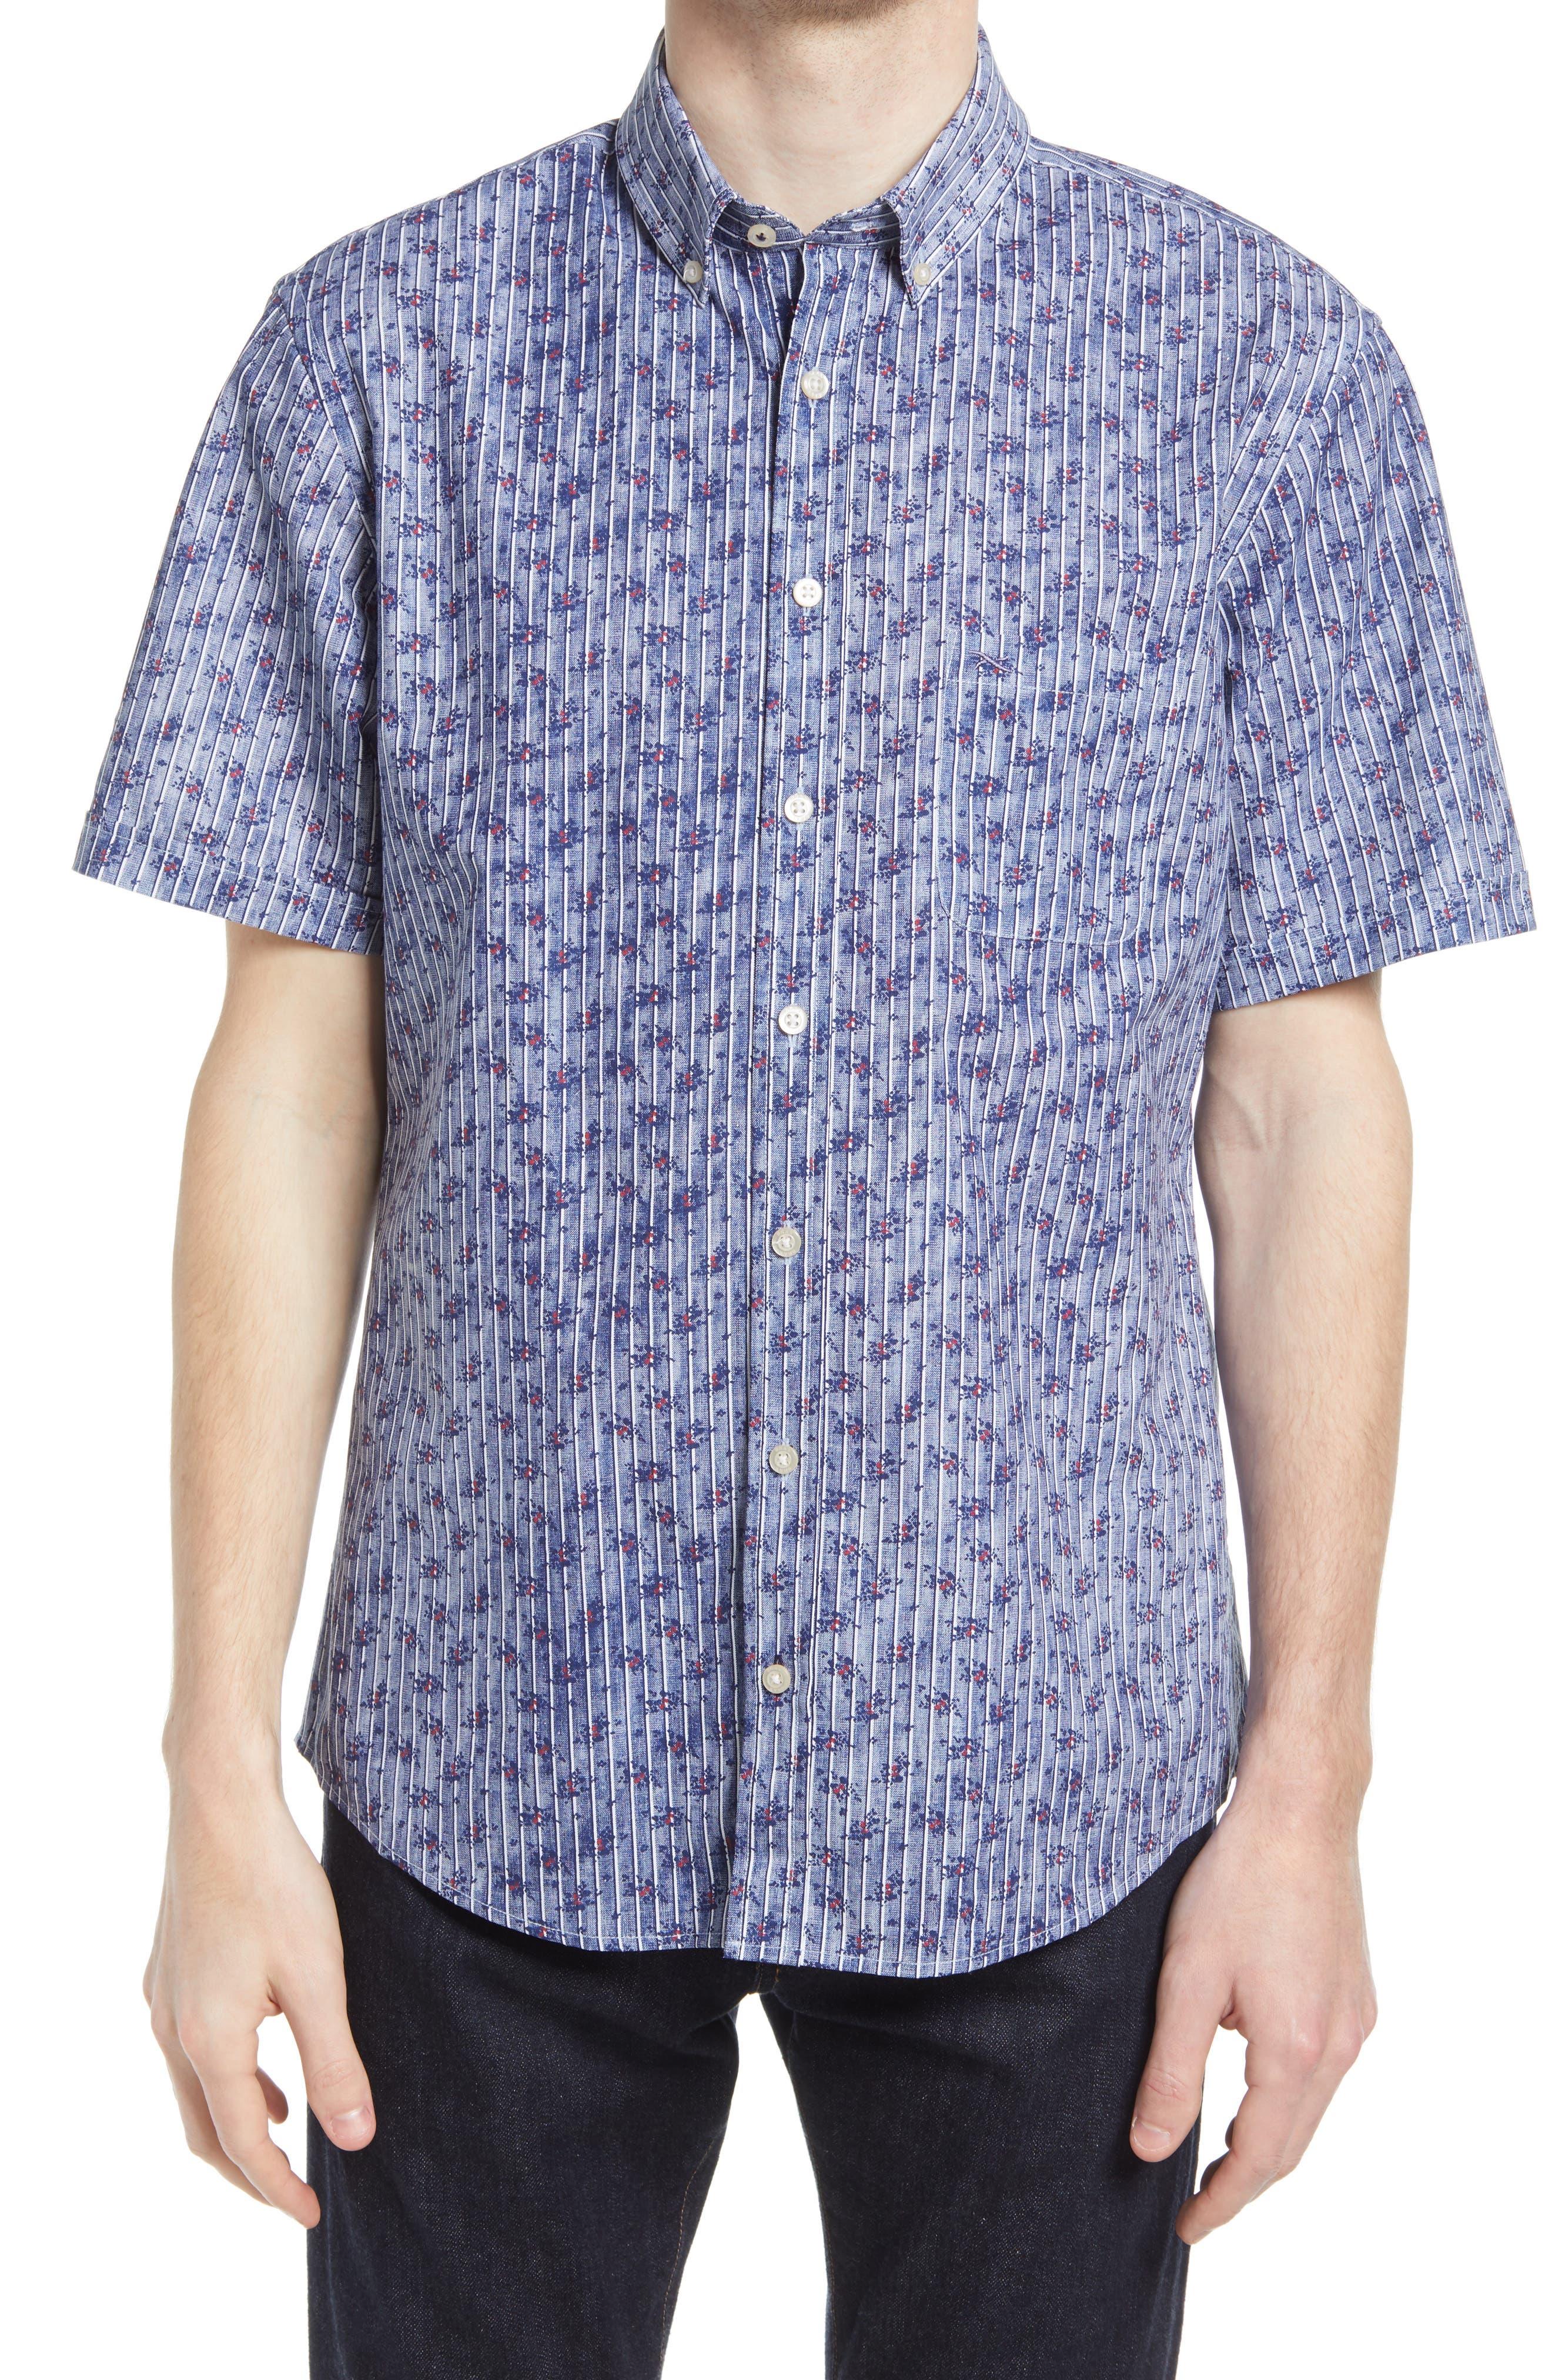 Dan Short Sleeve Button-Down Shirt